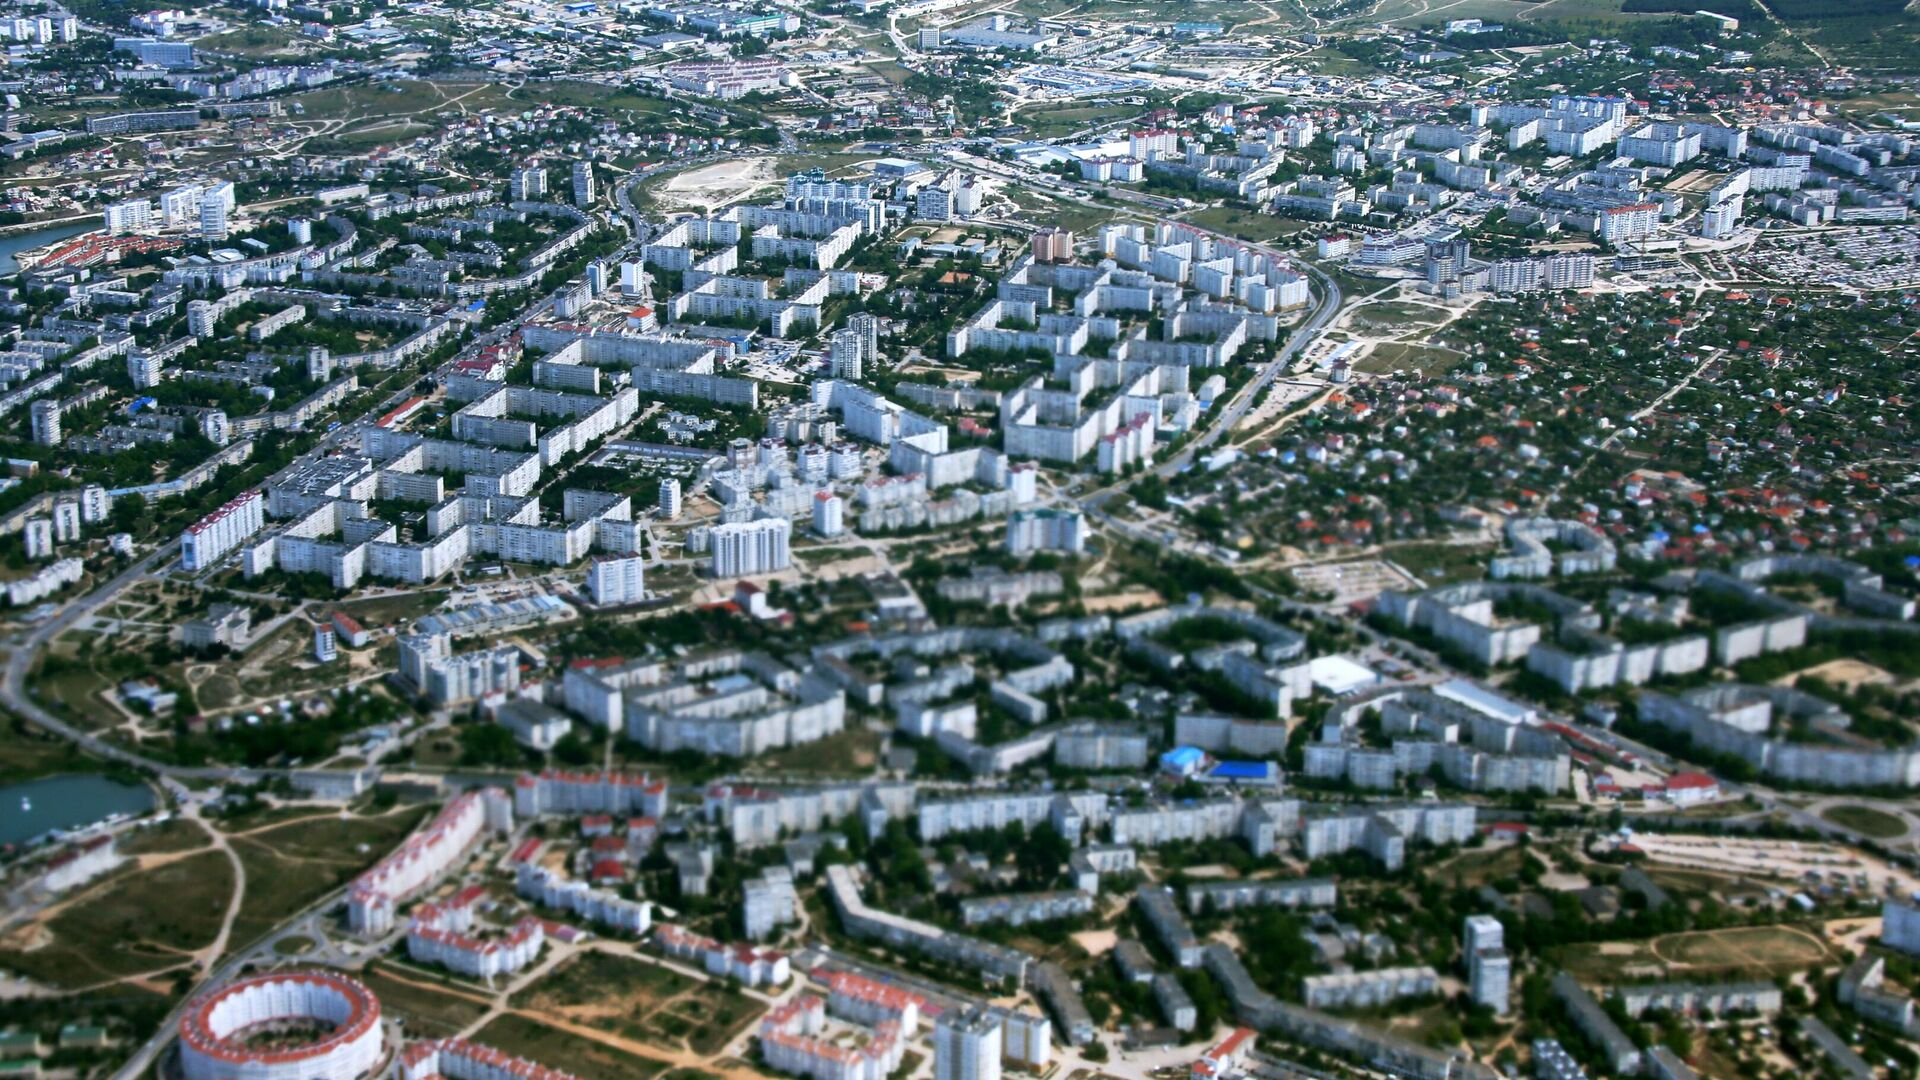 Вид на Севастополь из окна самолета - РИА Новости, 1920, 05.12.2020